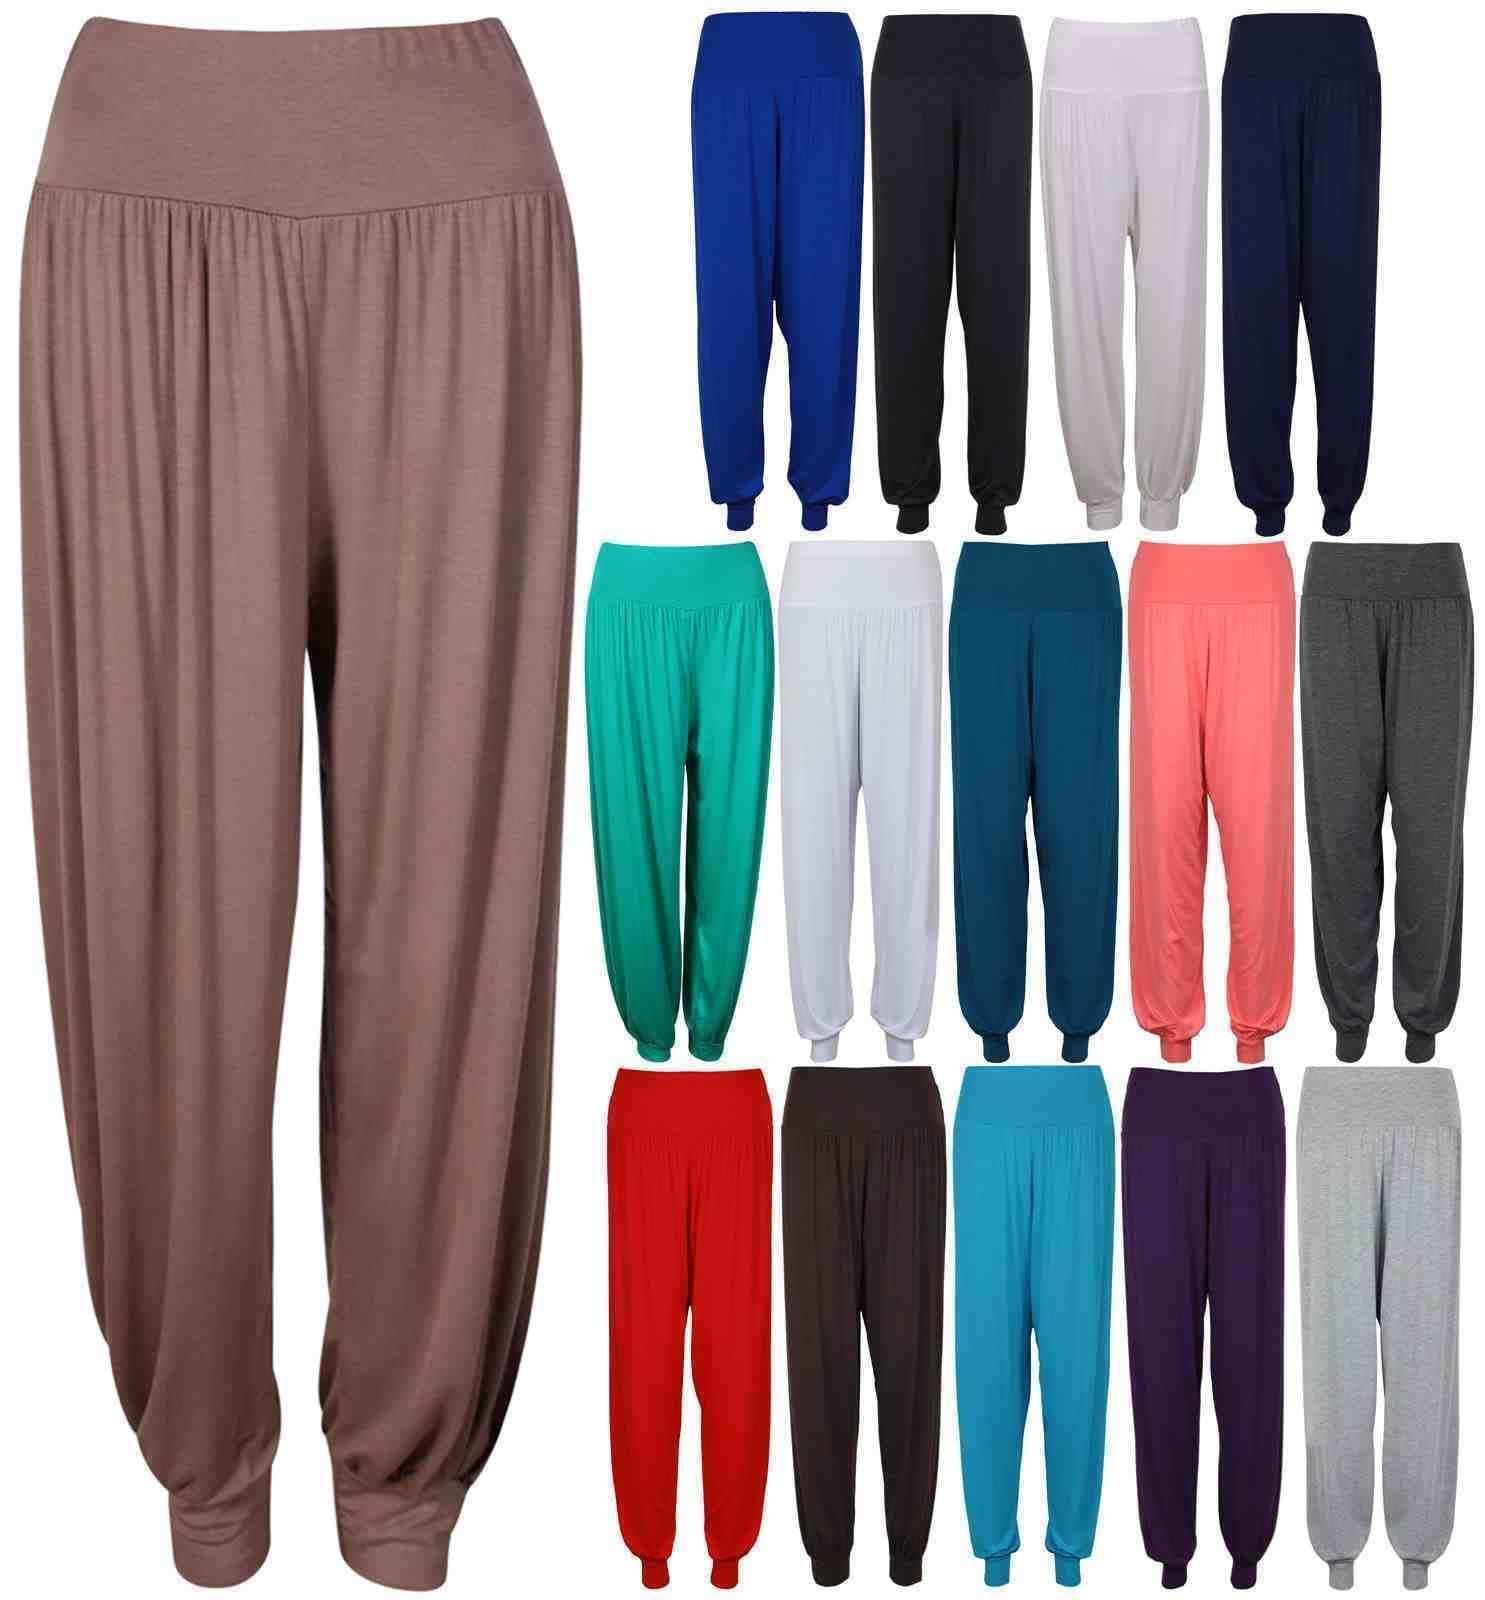 Womens harem trousers ALI BABA long pants baggy hareem leggings plus size 8-26